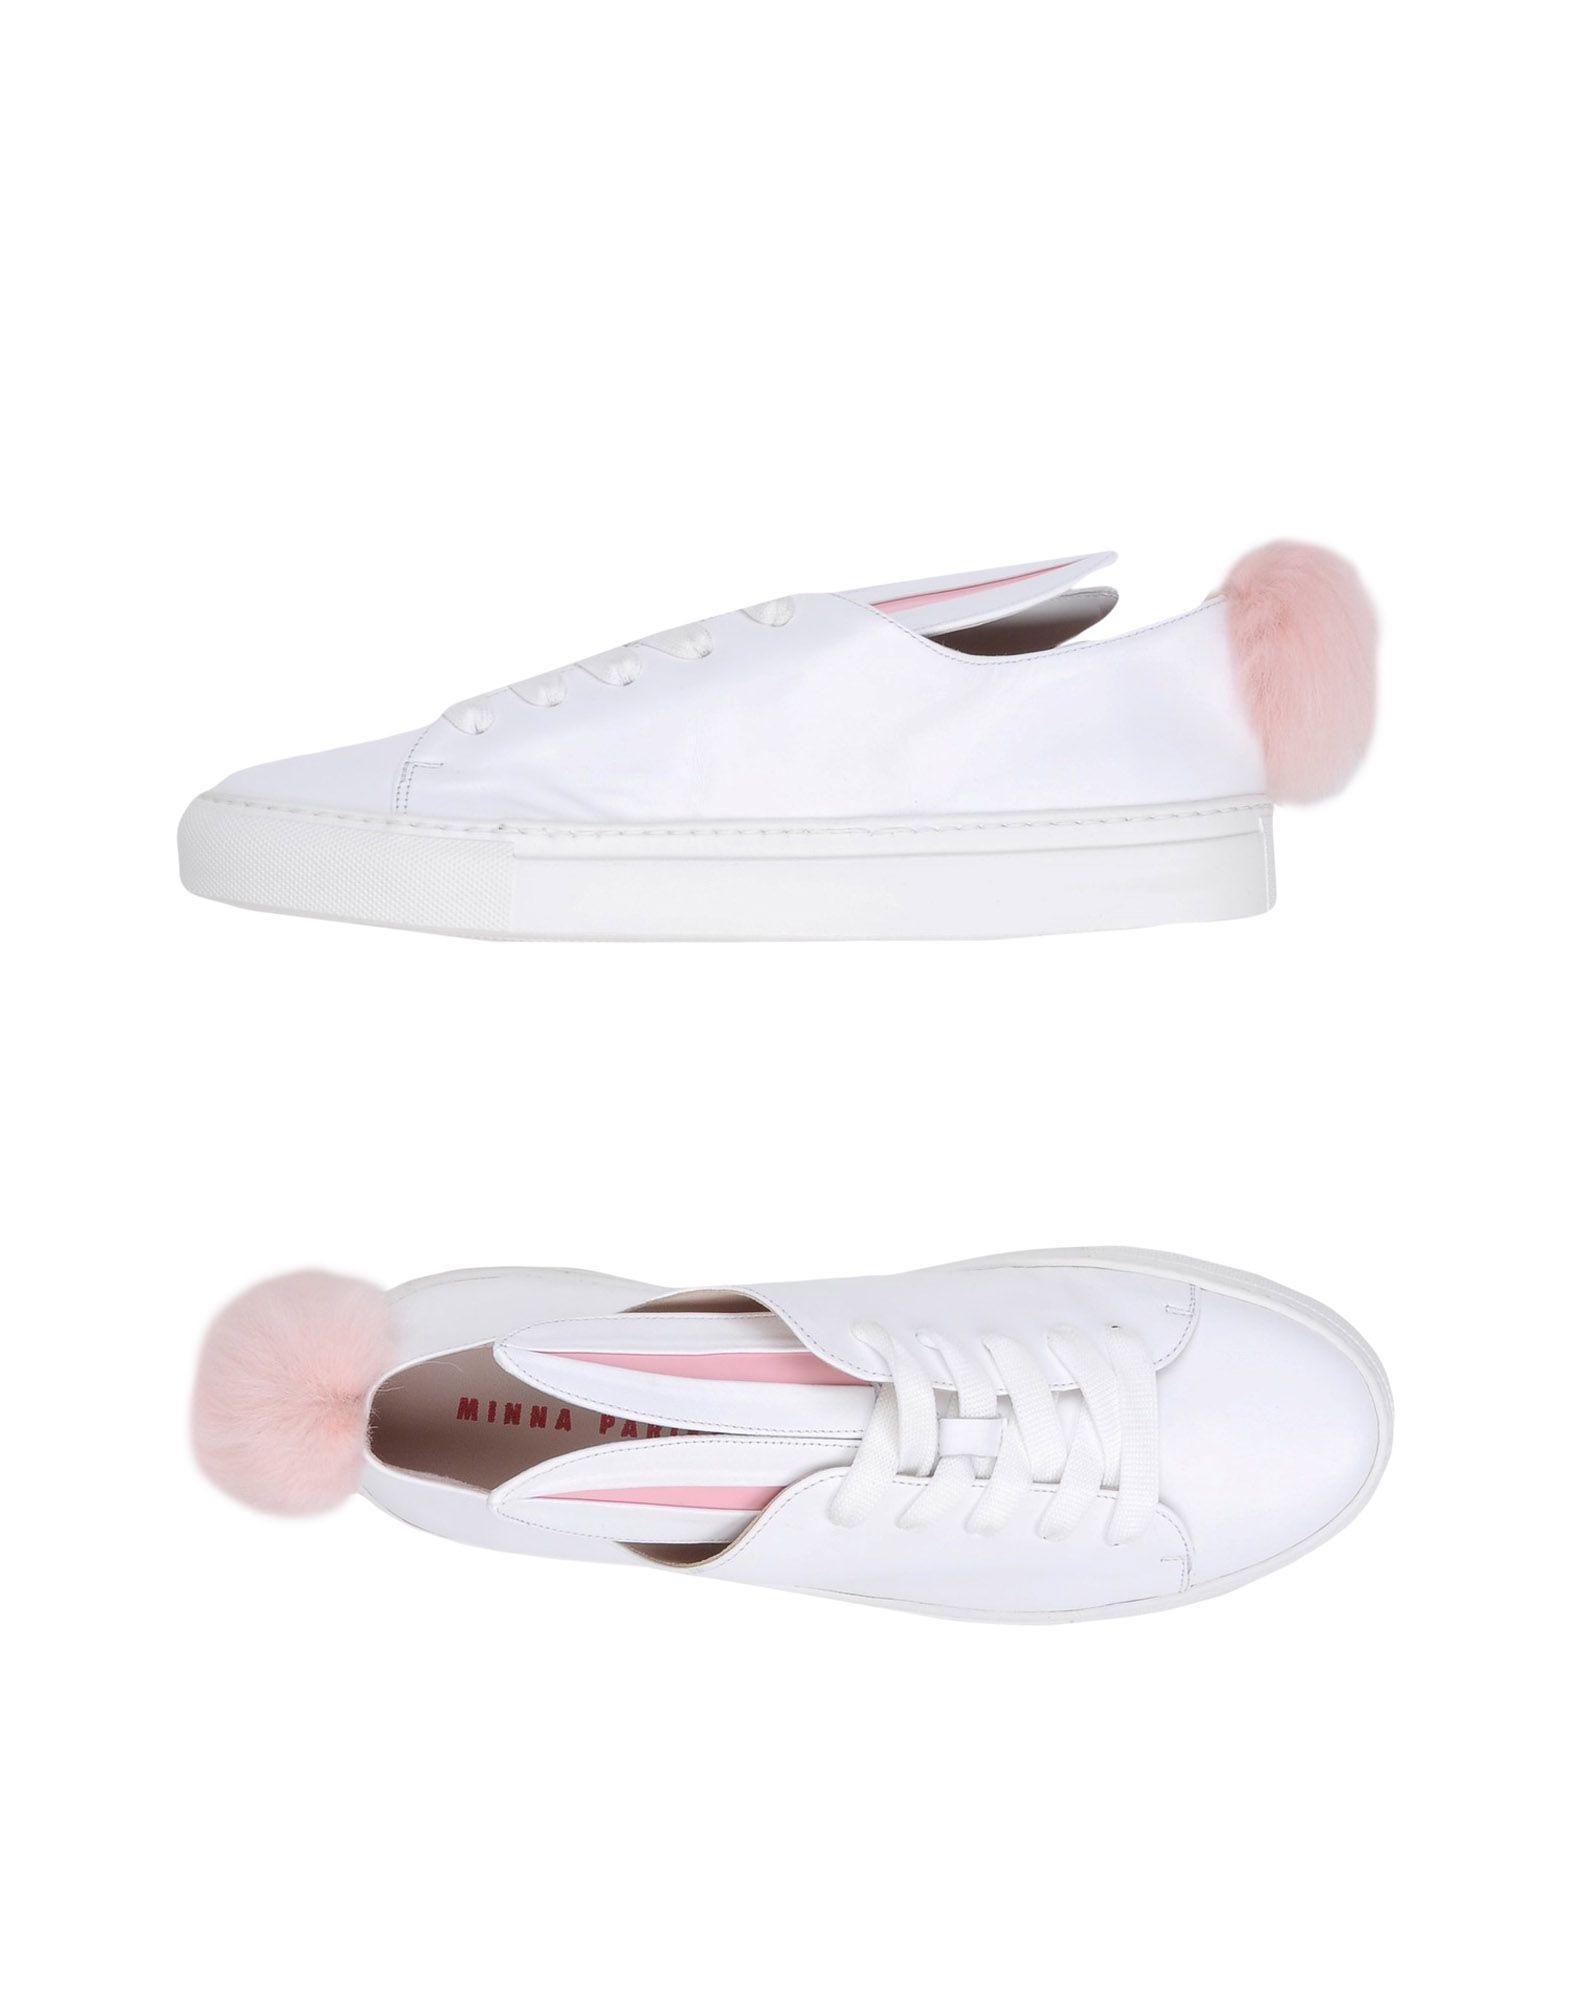 LOW TOP STAR GLITTER SNEAKER - FOOTWEAR - Low-tops & sneakers Minna Parikka q2uL5t